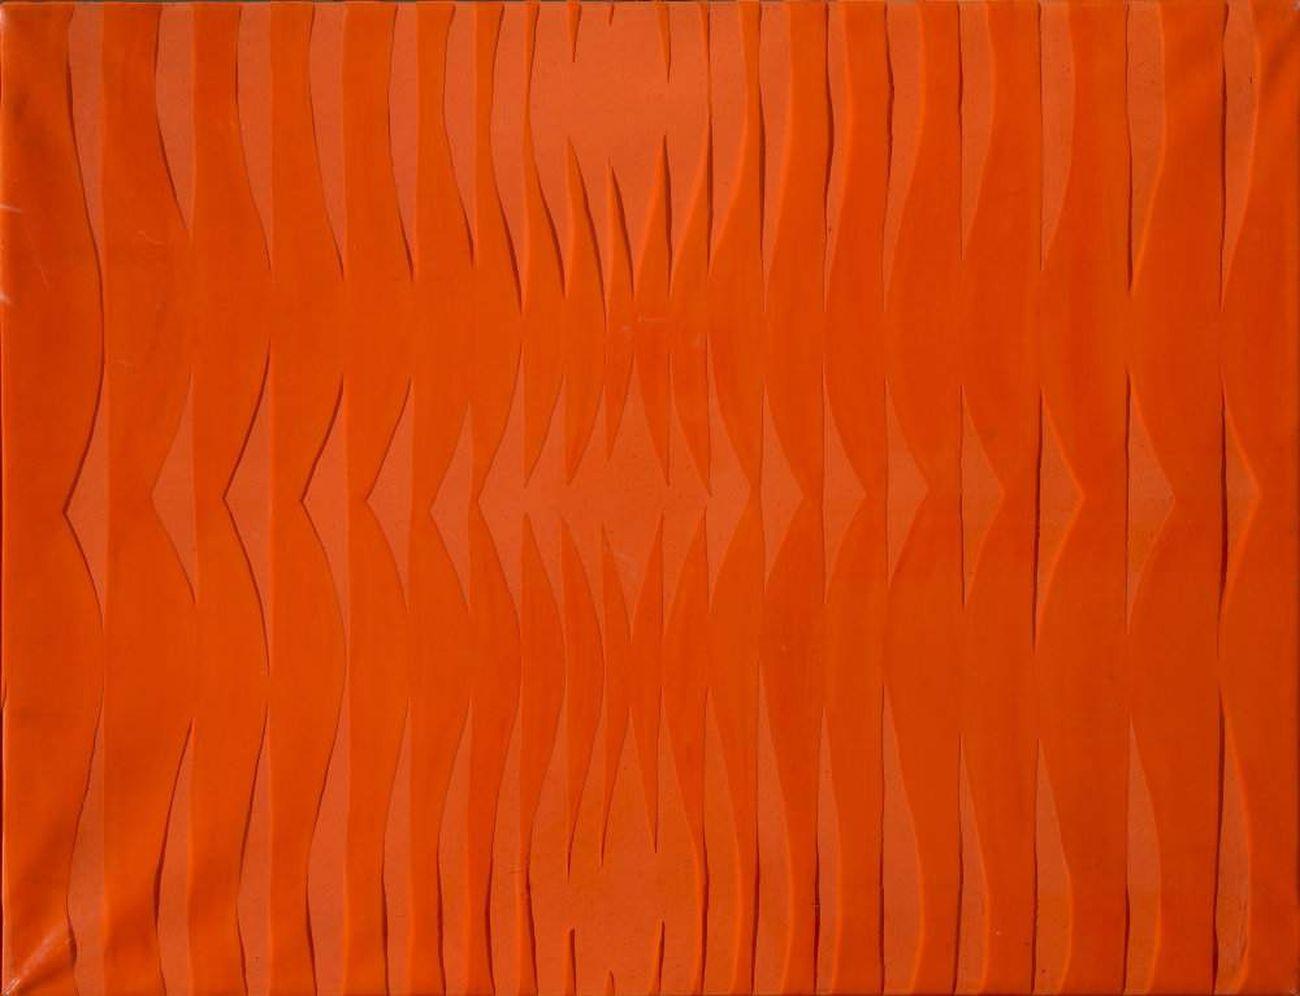 Carla Accardi, Arancio arancio, 1966